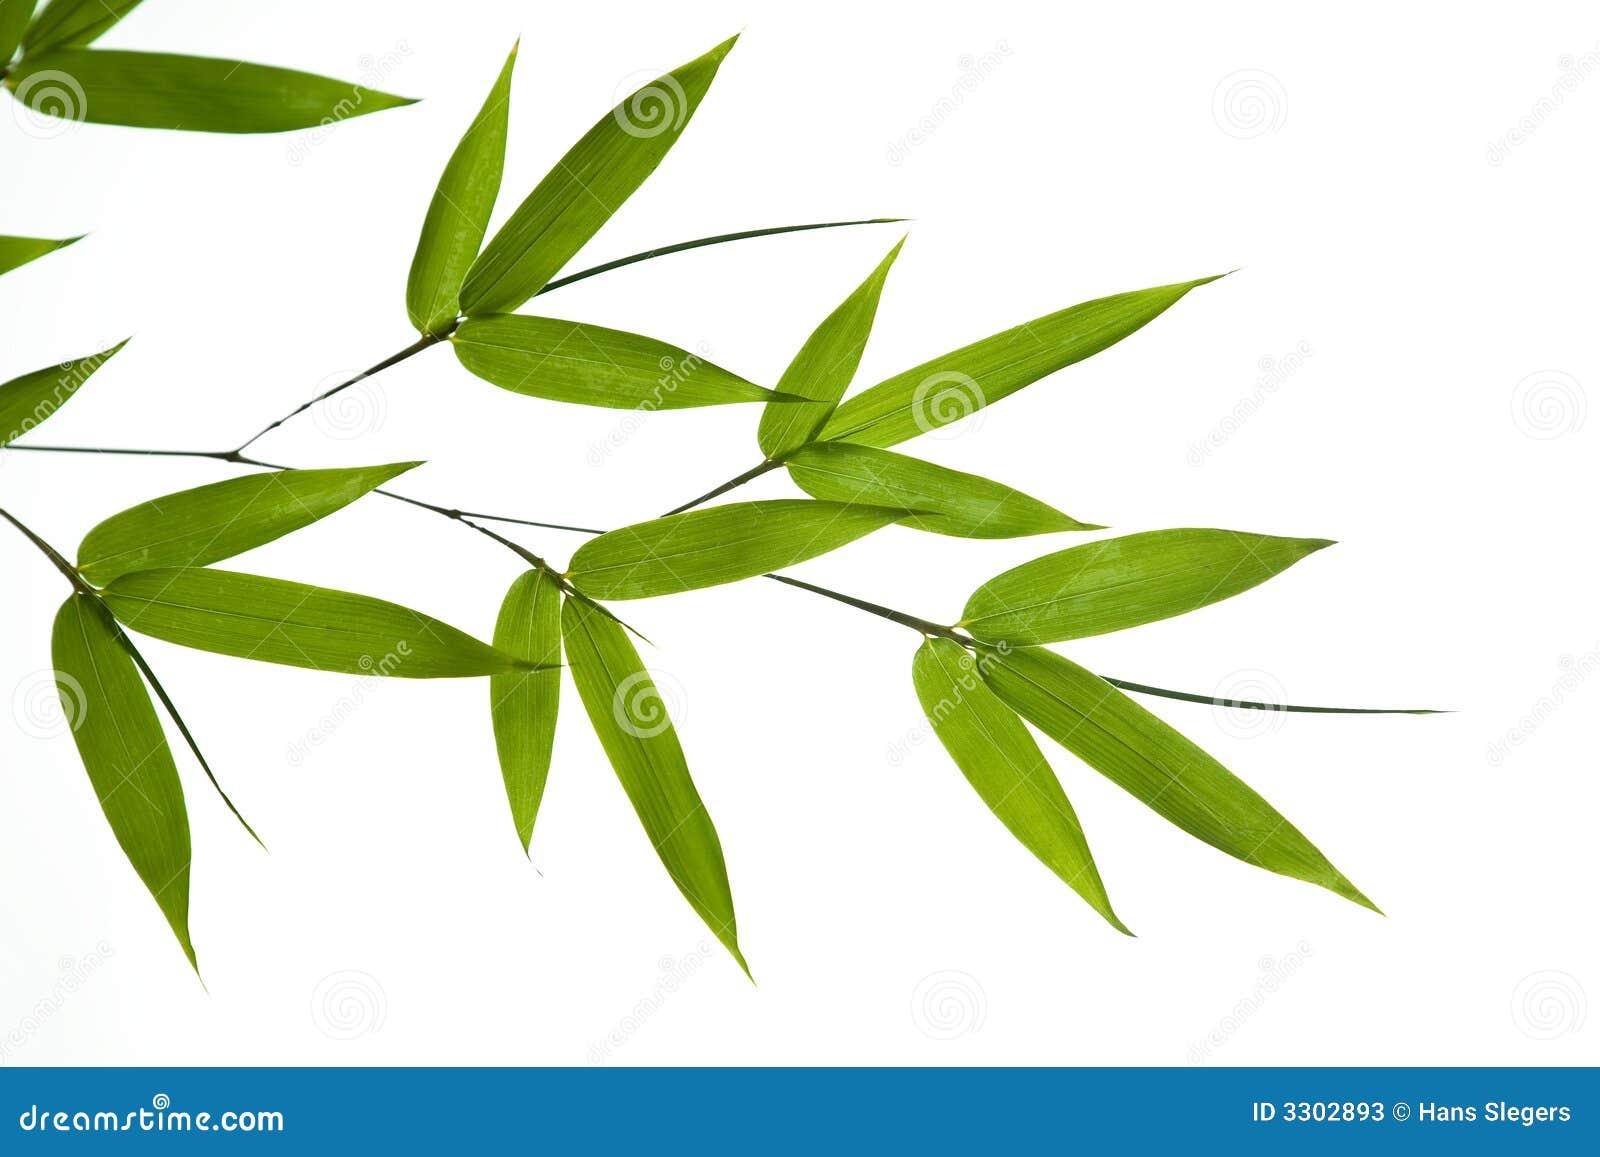 Рисунок листа бамбука